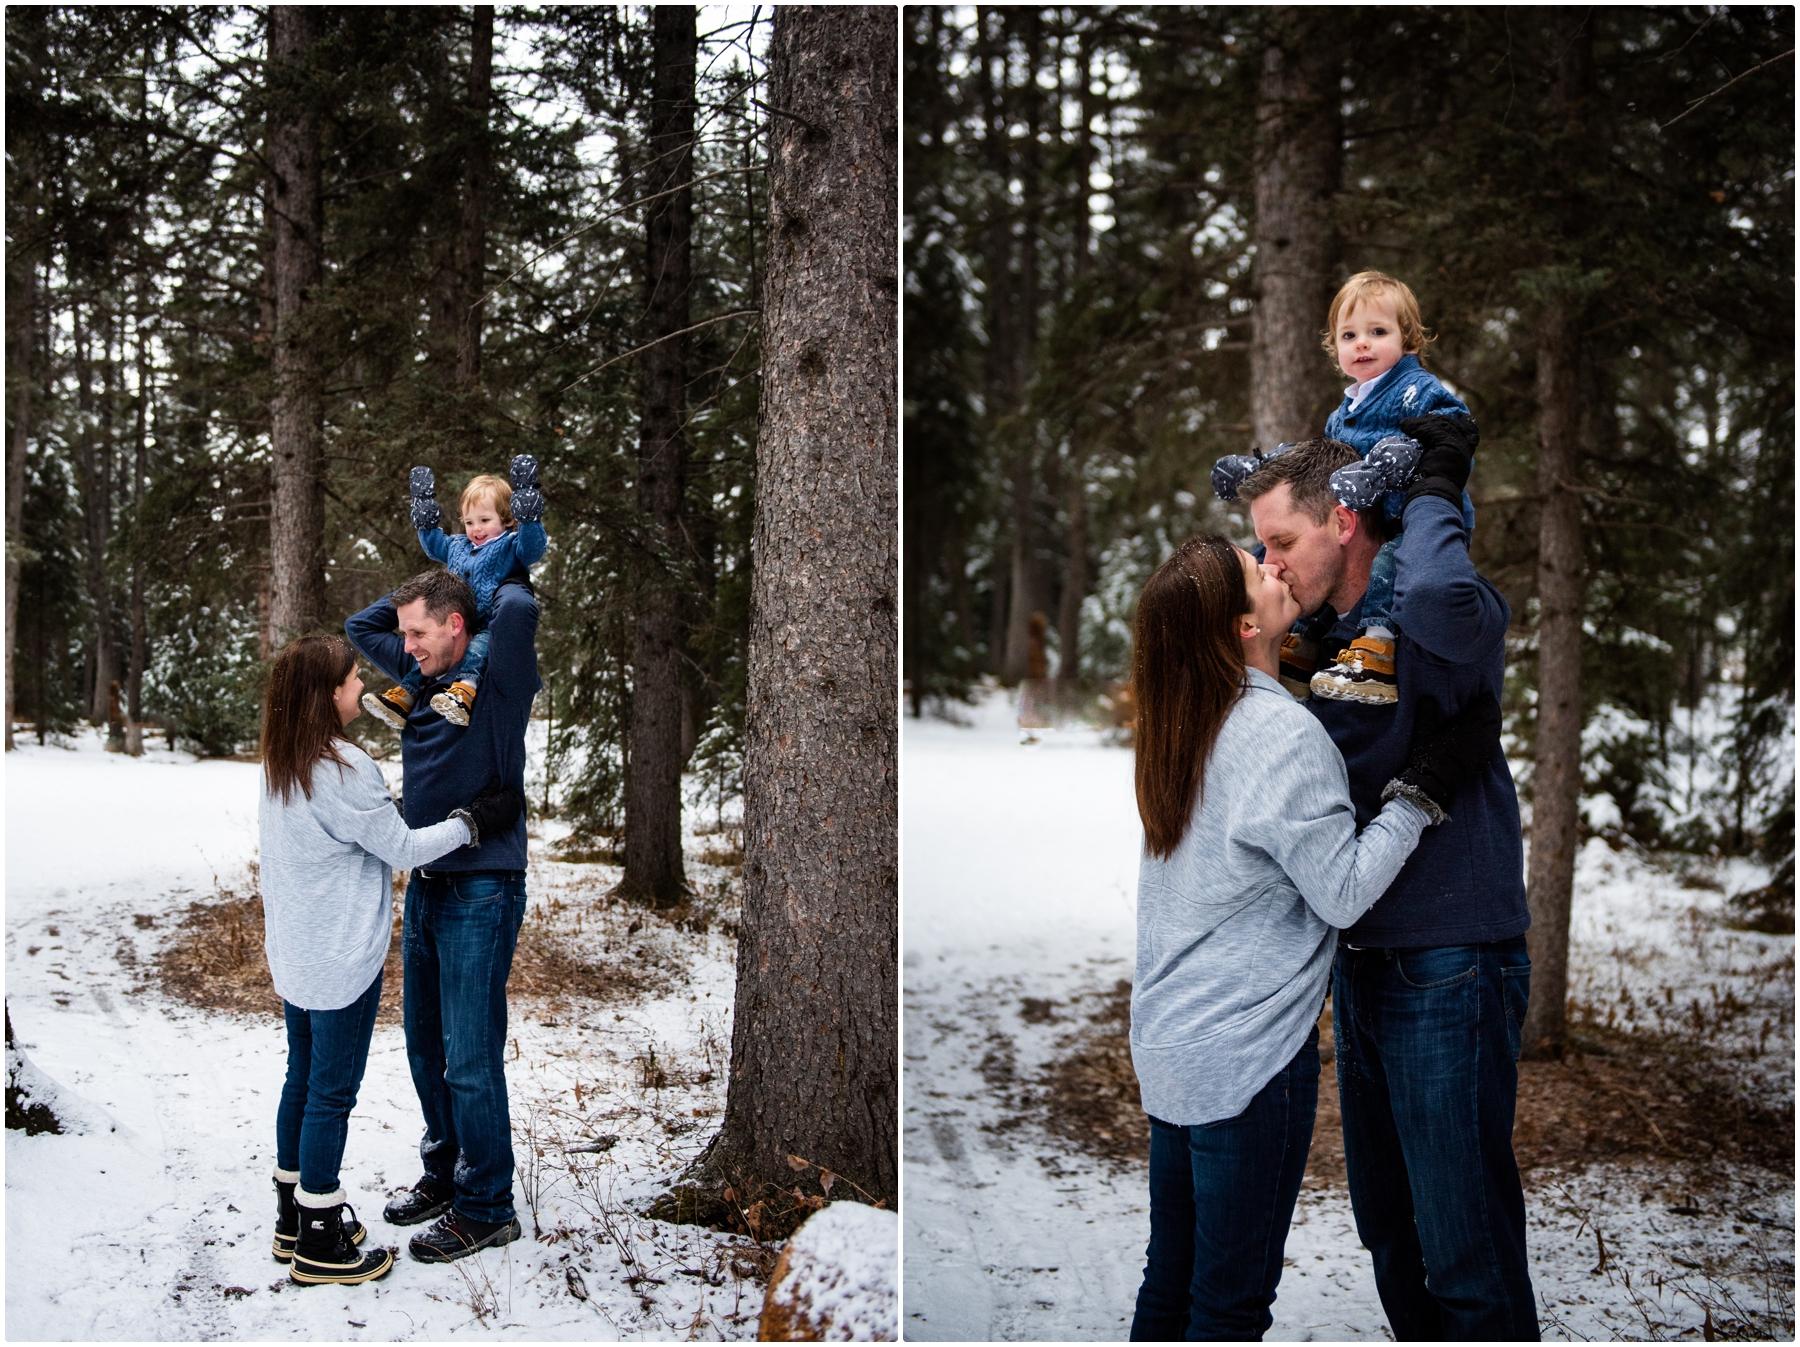 Family Photographers Calgary Ab - Shannon Terrace Fish Creek Park